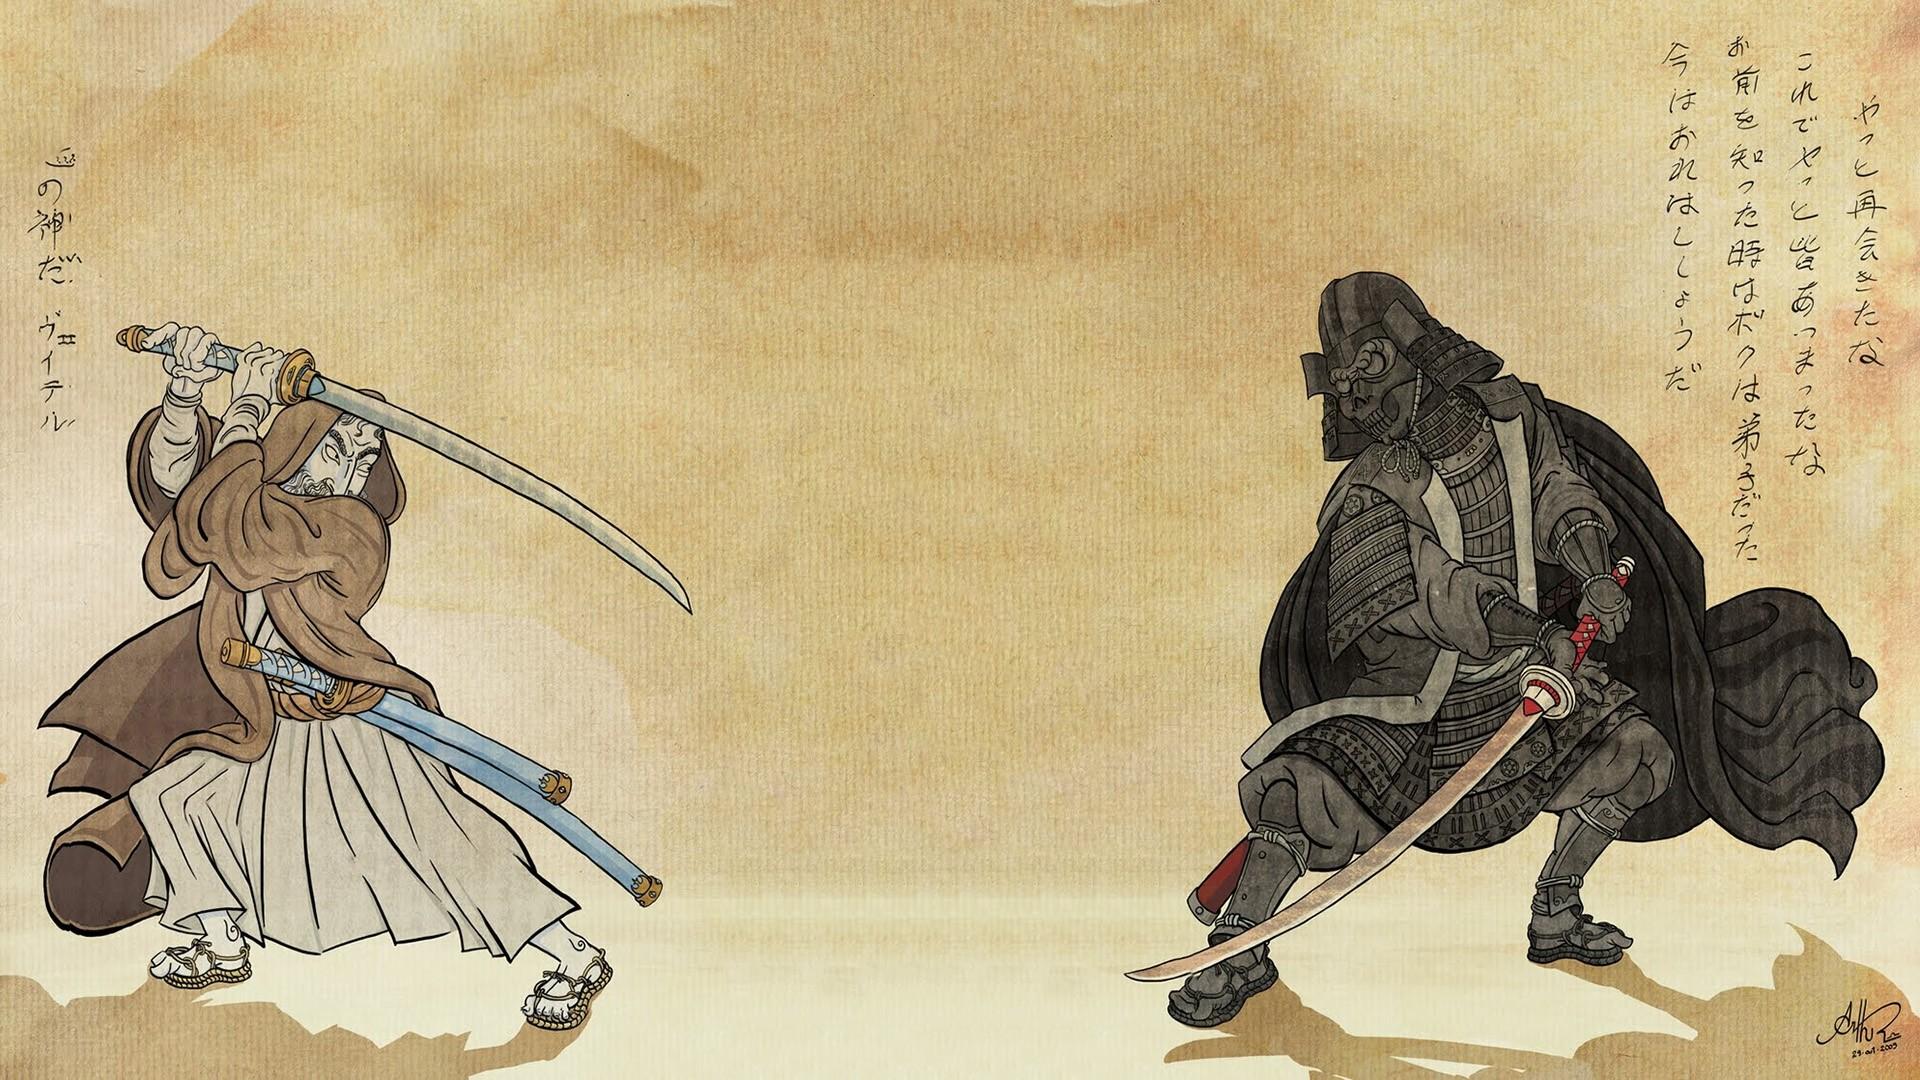 Star Wars Wallpapers Japanese Woodblock Prints Samurai 1920x1080 Wallpaper Teahub Io